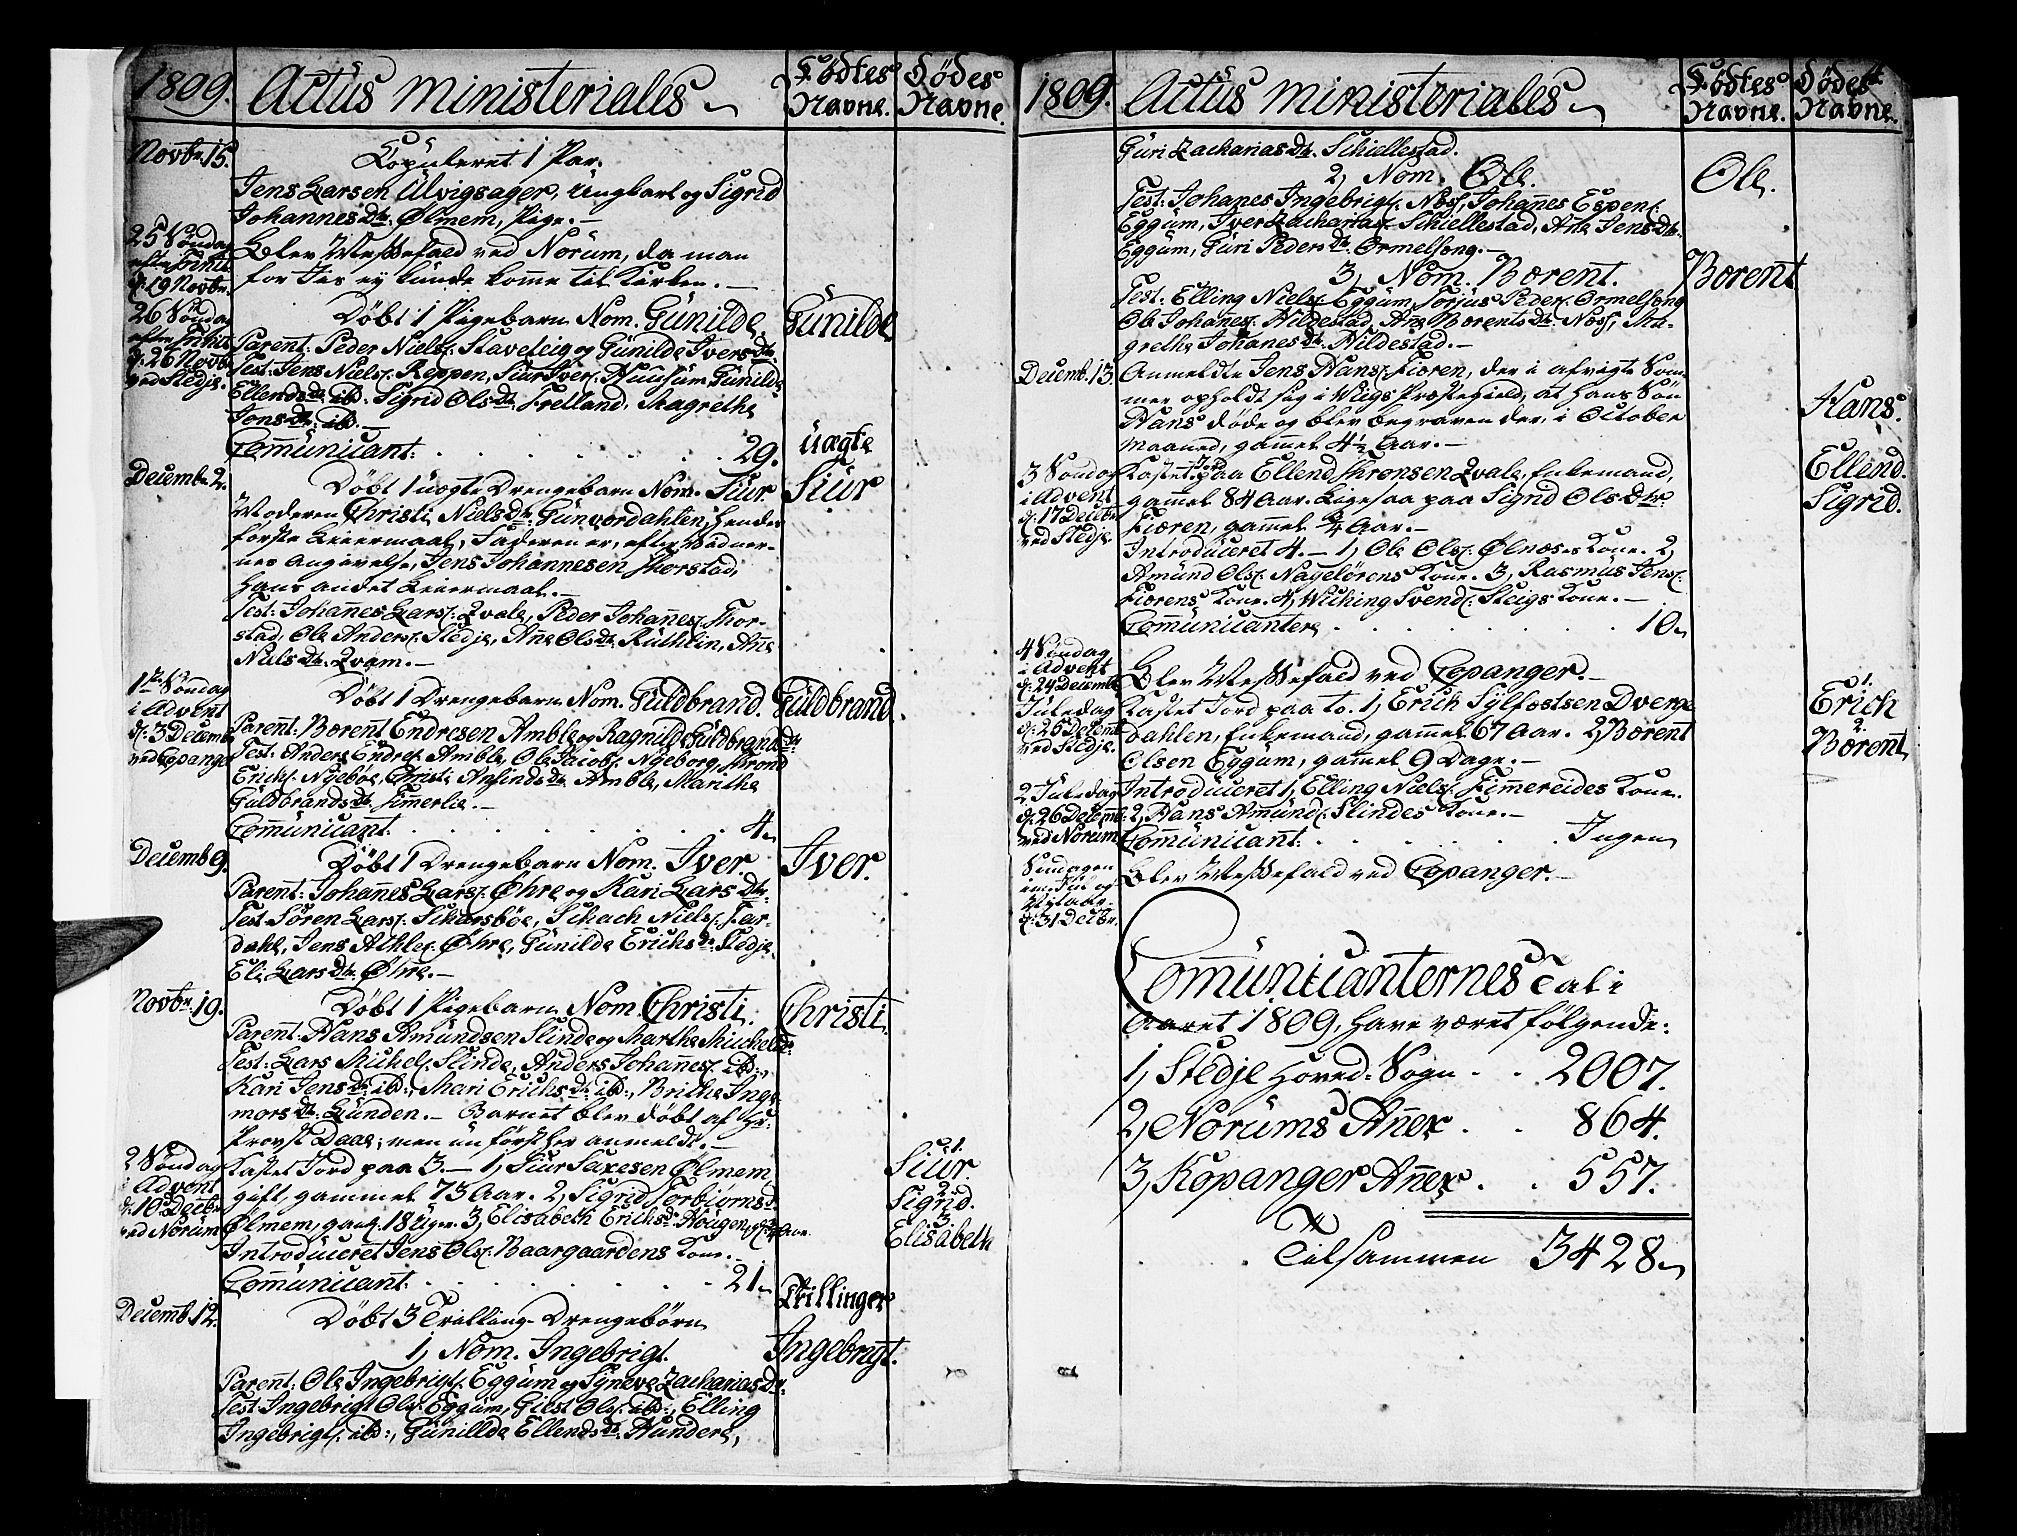 SAB, Sogndal sokneprestembete, H/Haa/Haaa/L0009: Ministerialbok nr. A 9, 1809-1821, s. 4